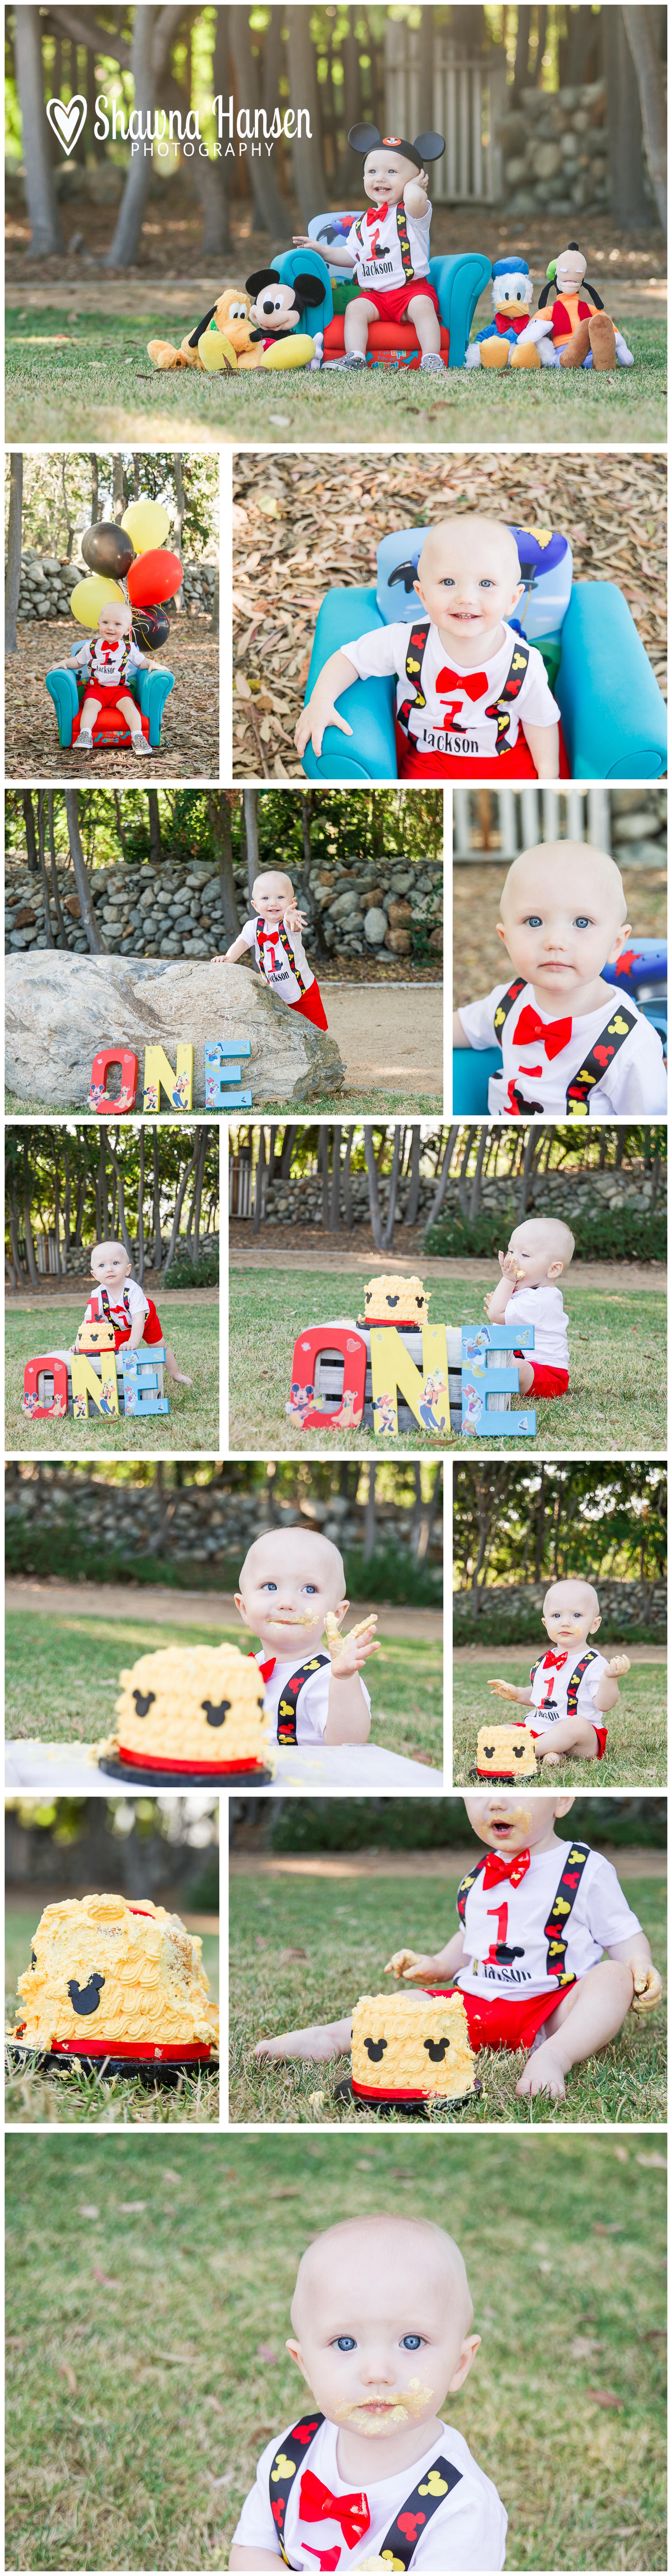 Jackson collage